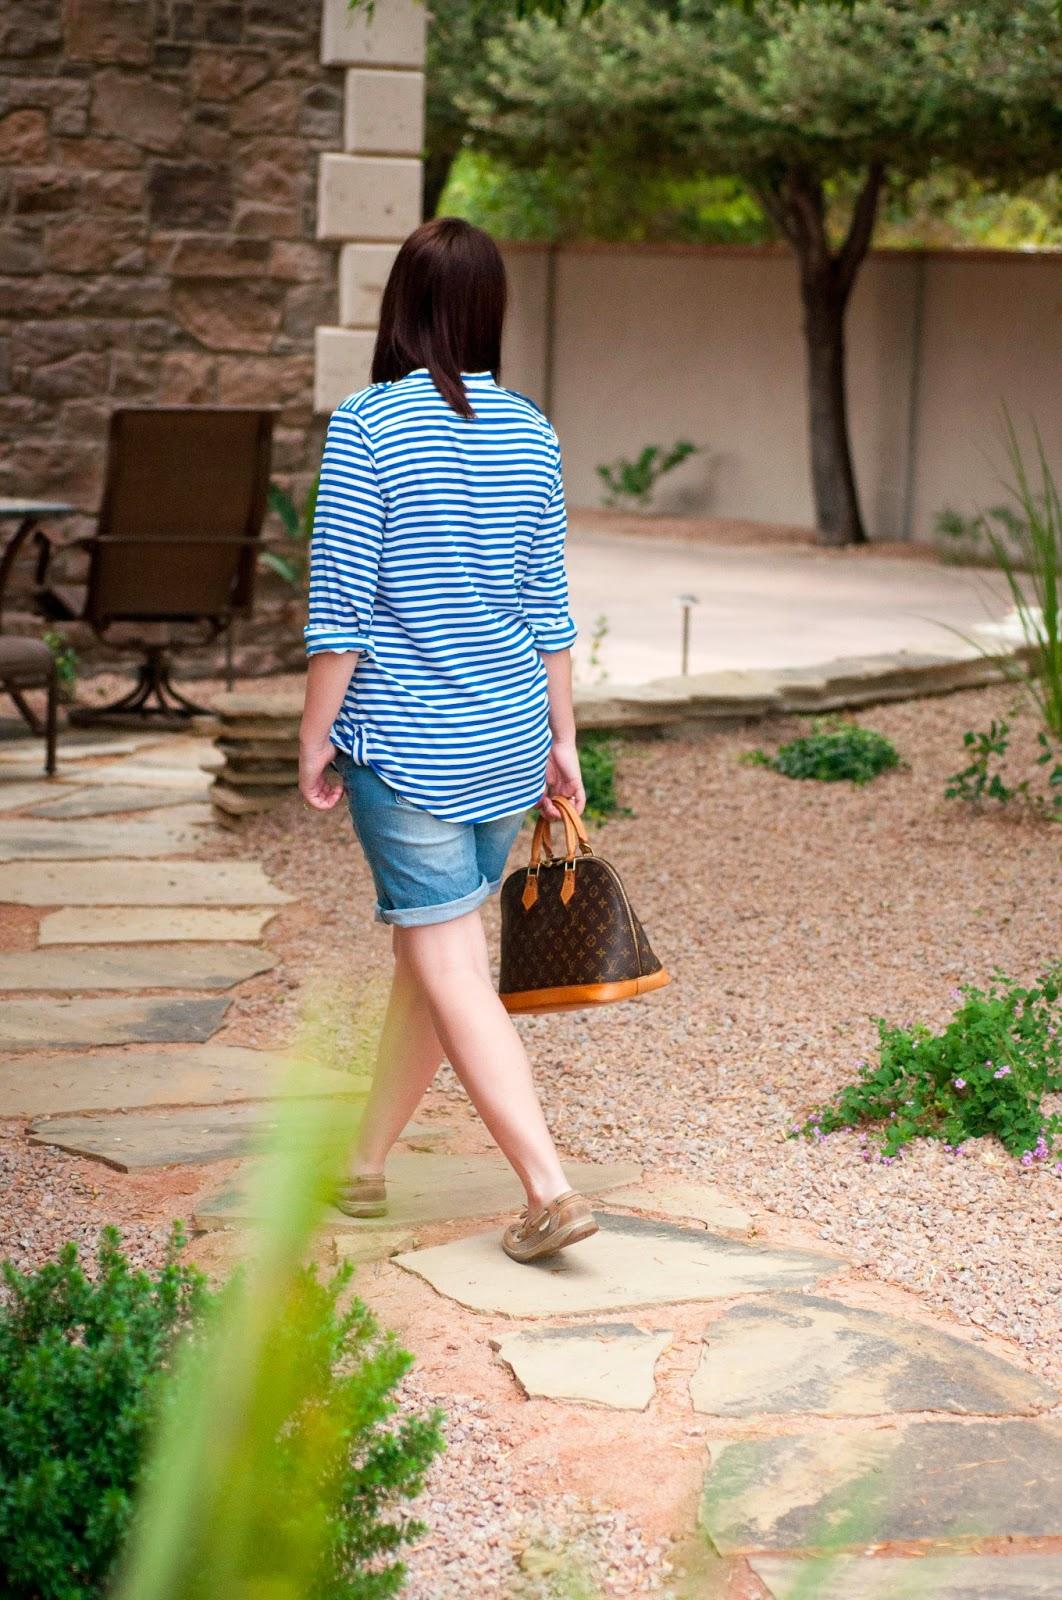 louis vuitton monogram print, calvin klein stripped shirt, calvin klein, ootd, sperry topsider for women, fashion blog, style blog, utah blogger